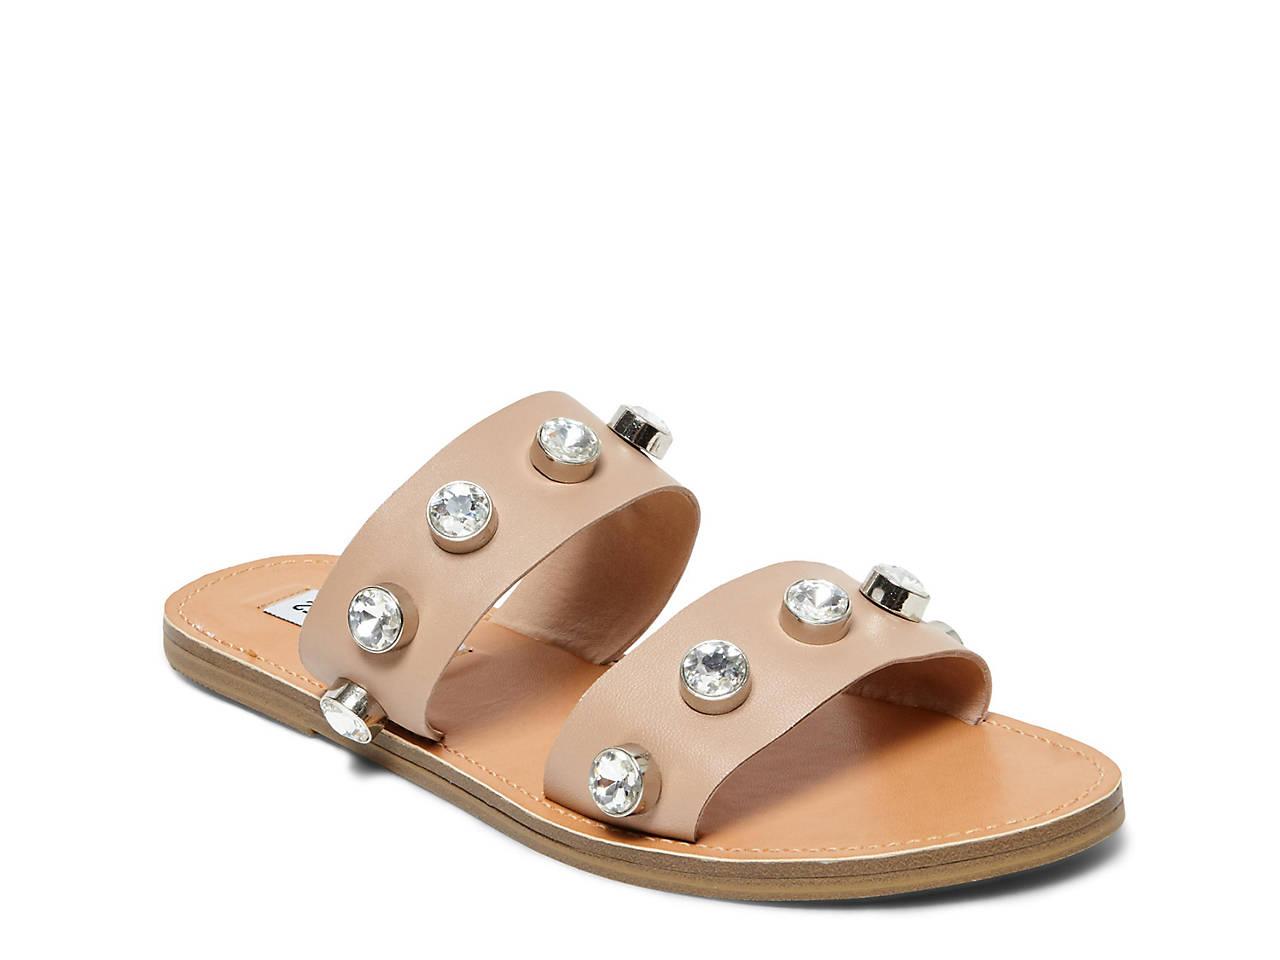 24b7f60d3cc4 Steve Madden Jessy Sandal Women s Shoes